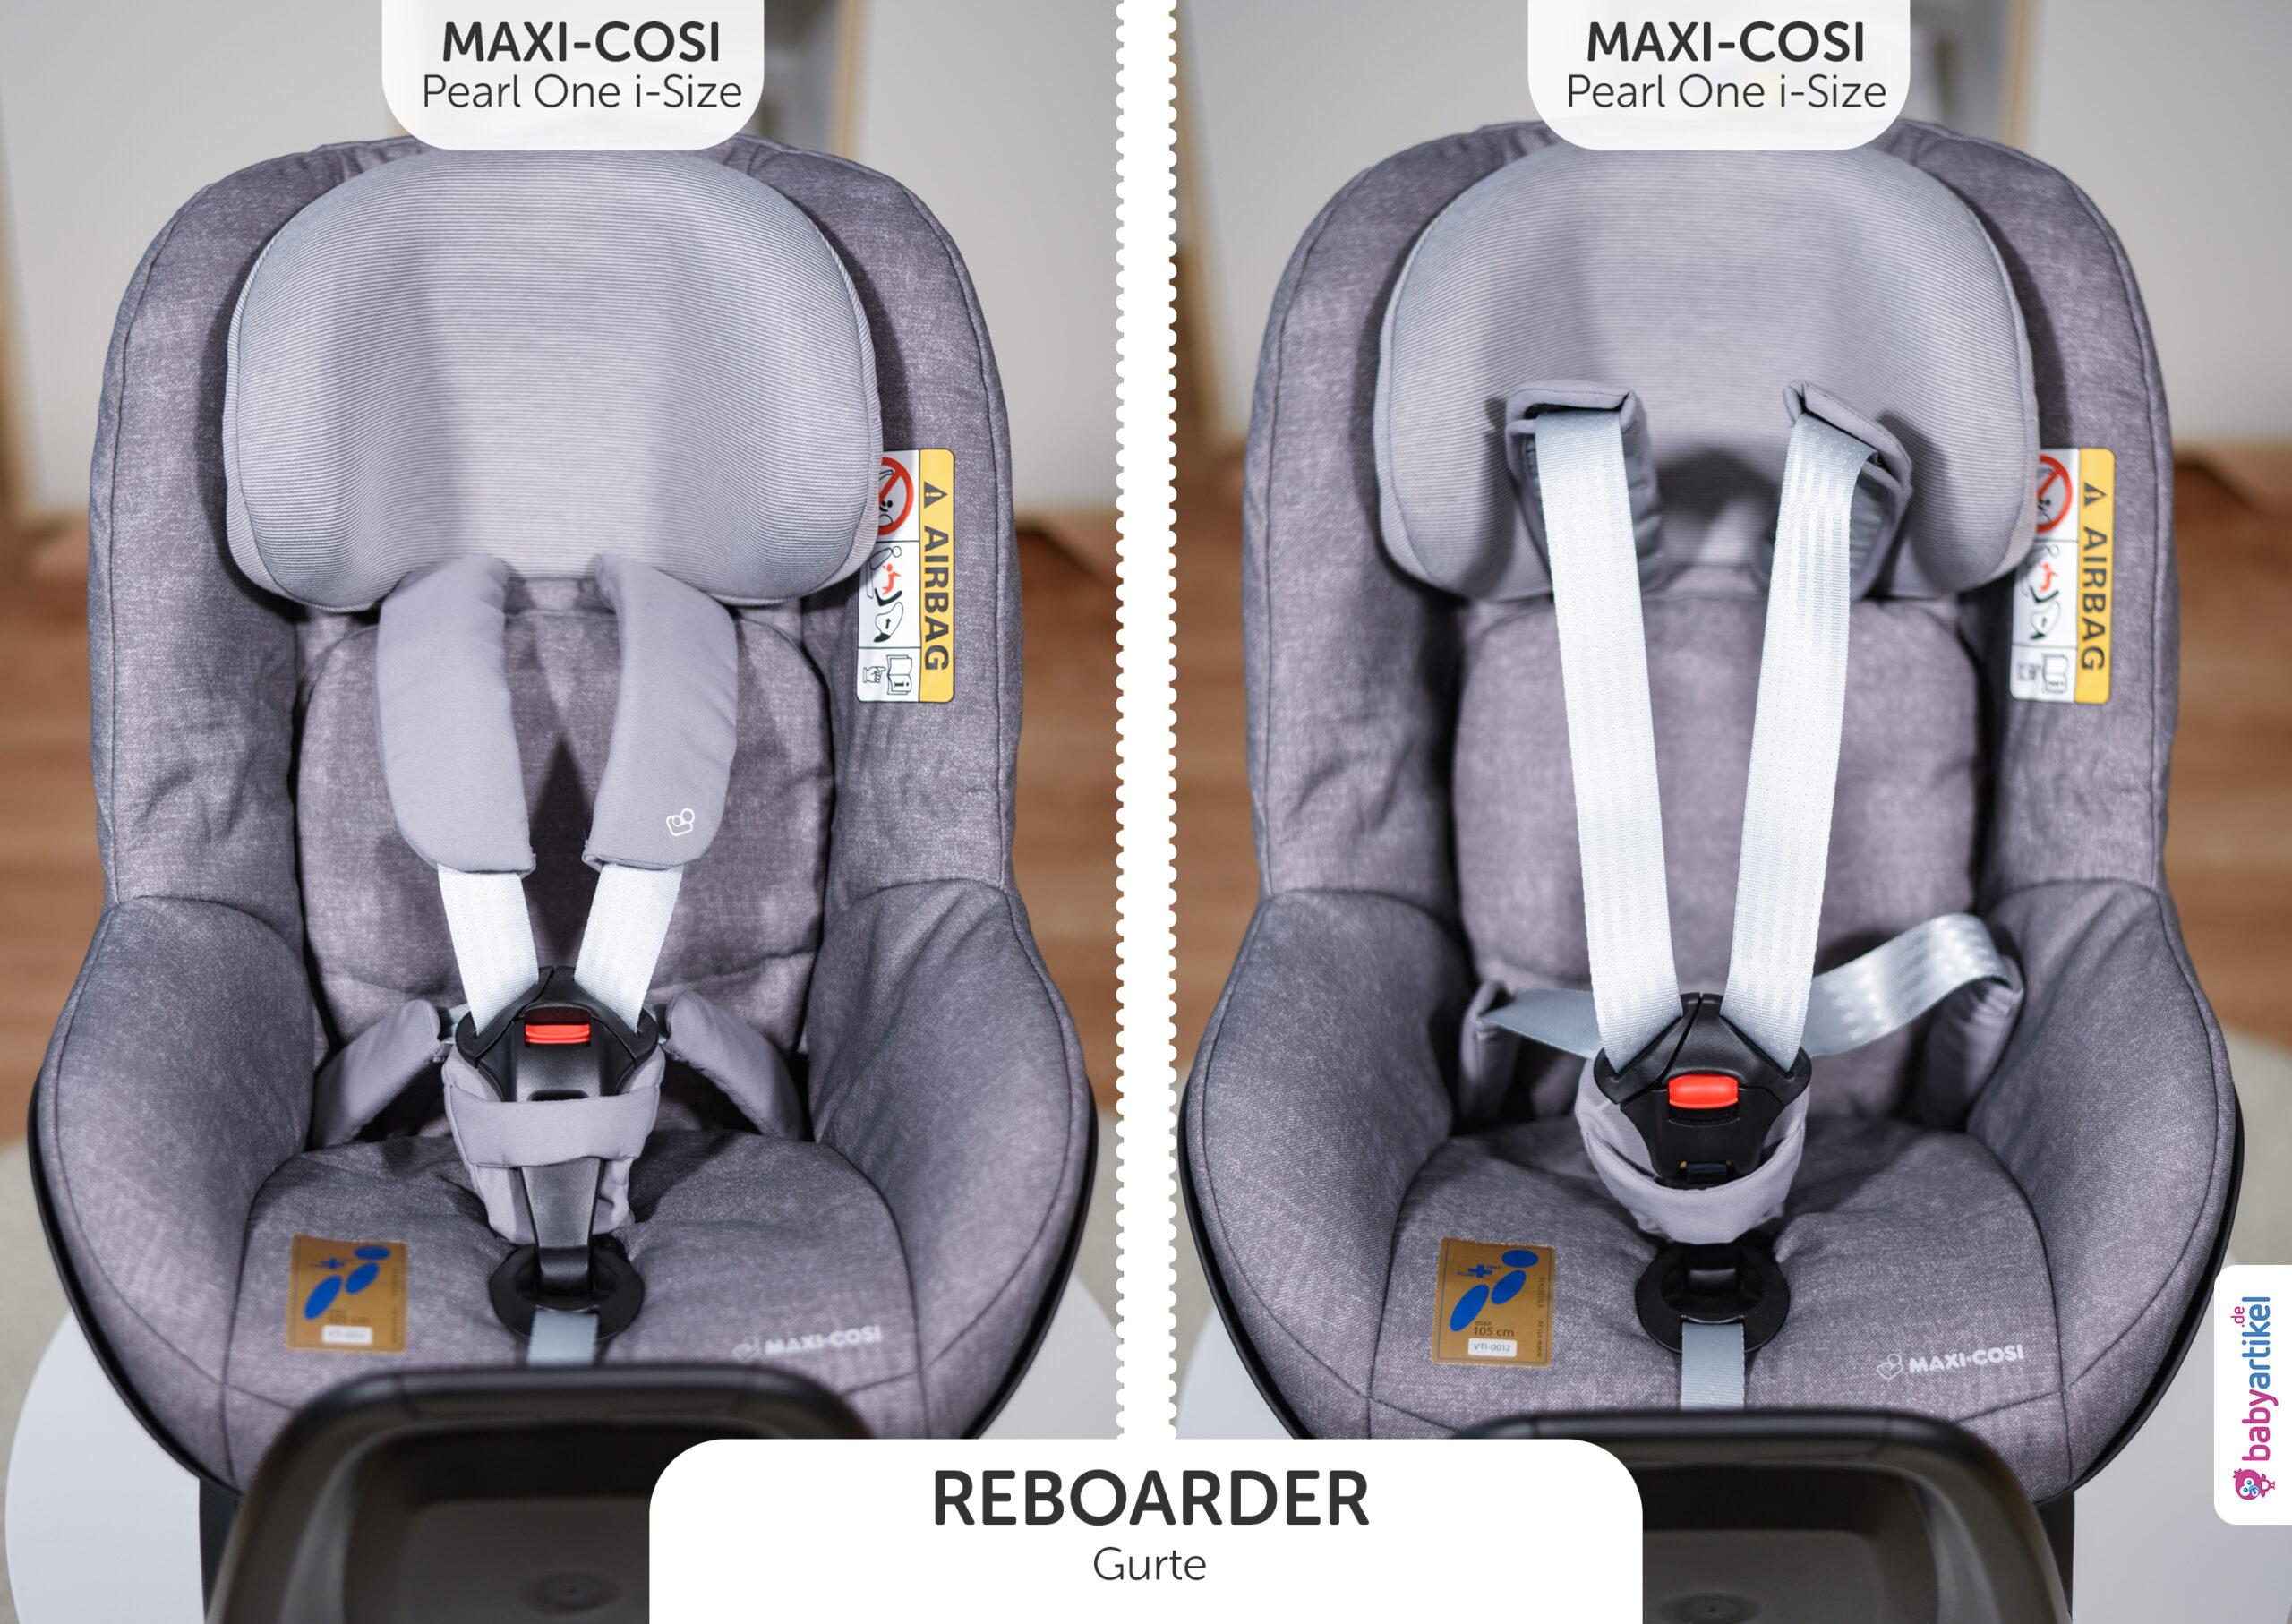 Maxi Cosi Pearl One i-Size 5-Punkt Gurt